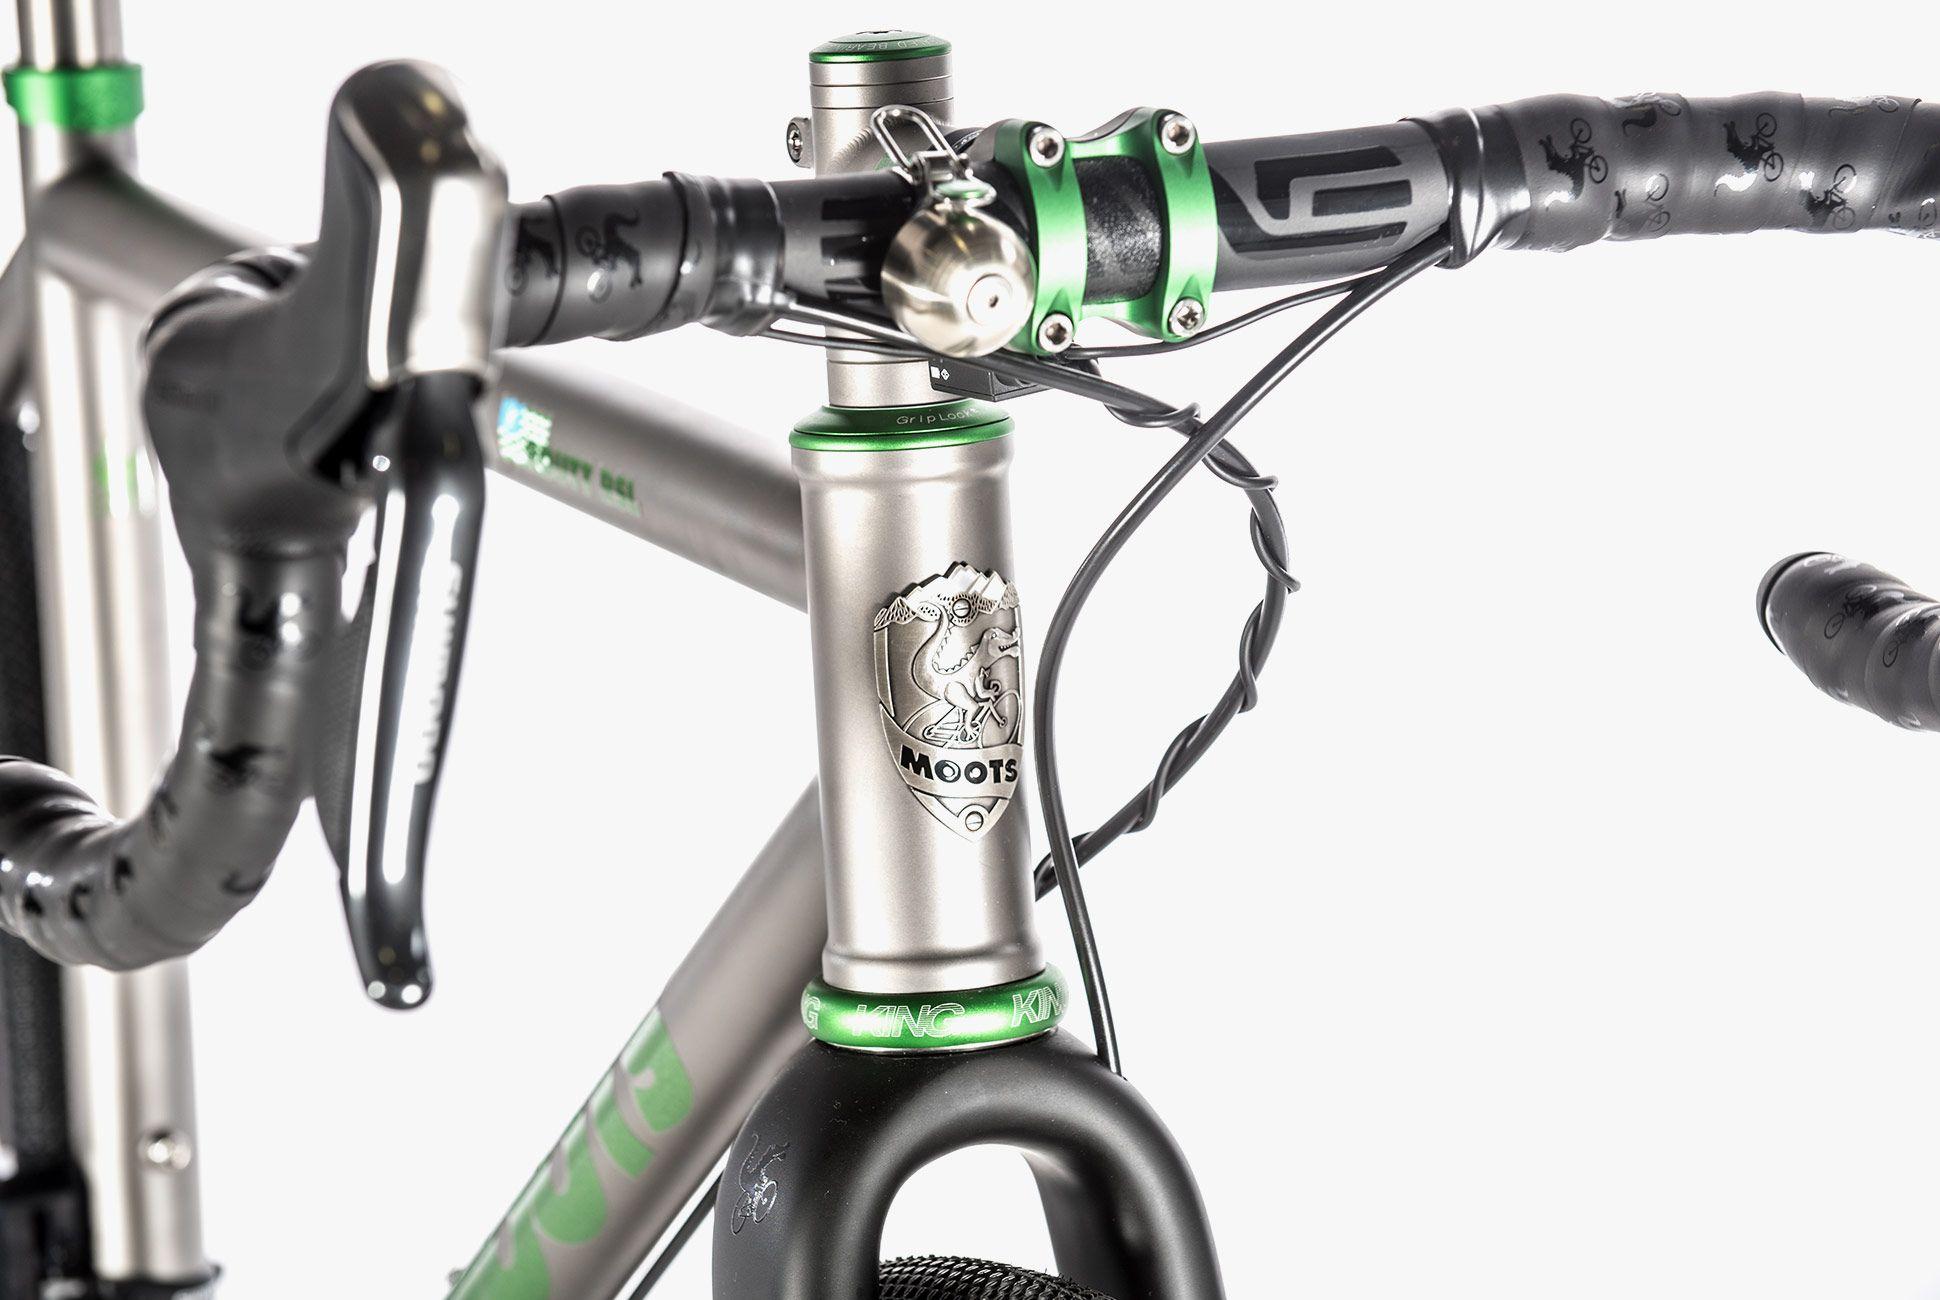 Bikes-From-NAHBS-Gear-Patrol-31